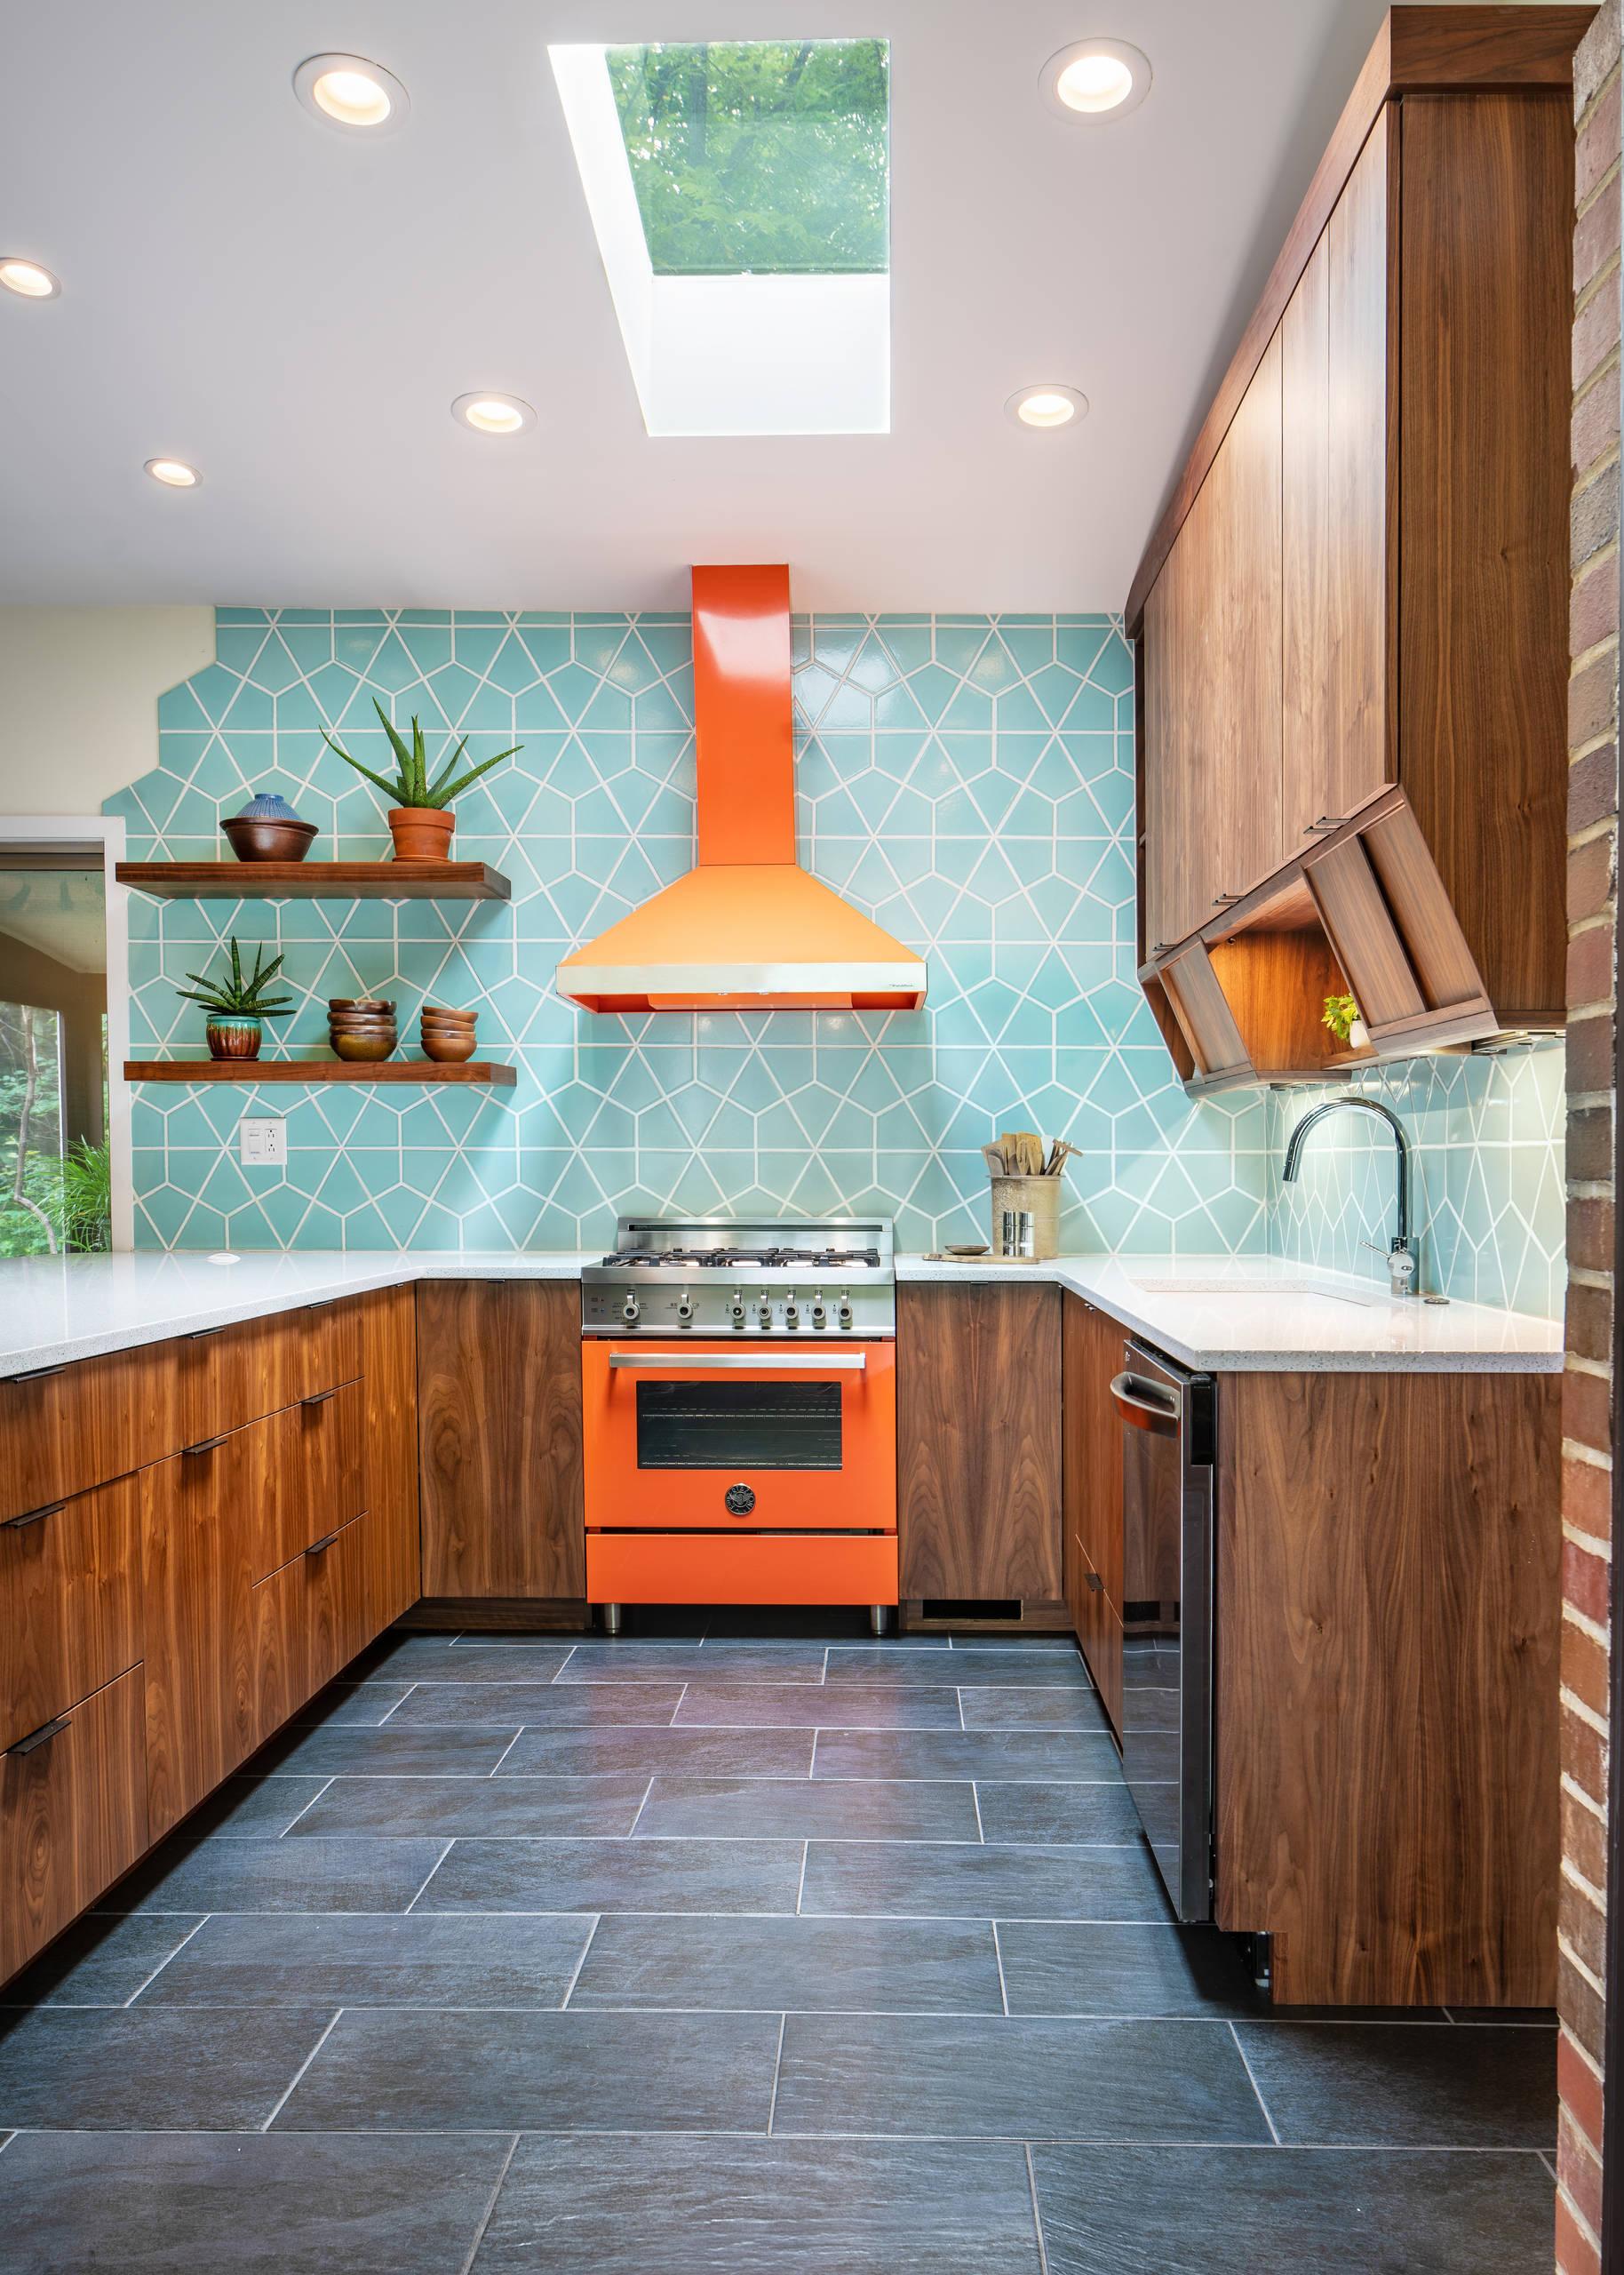 Teal Tile Backsplash Kitchen Ideas & Photos | Houzz Teal Kitchen Backsplash Ideas on teal glass tile kitchen backsplash, teal kitchen paint color ideas, teal painted backsplash,